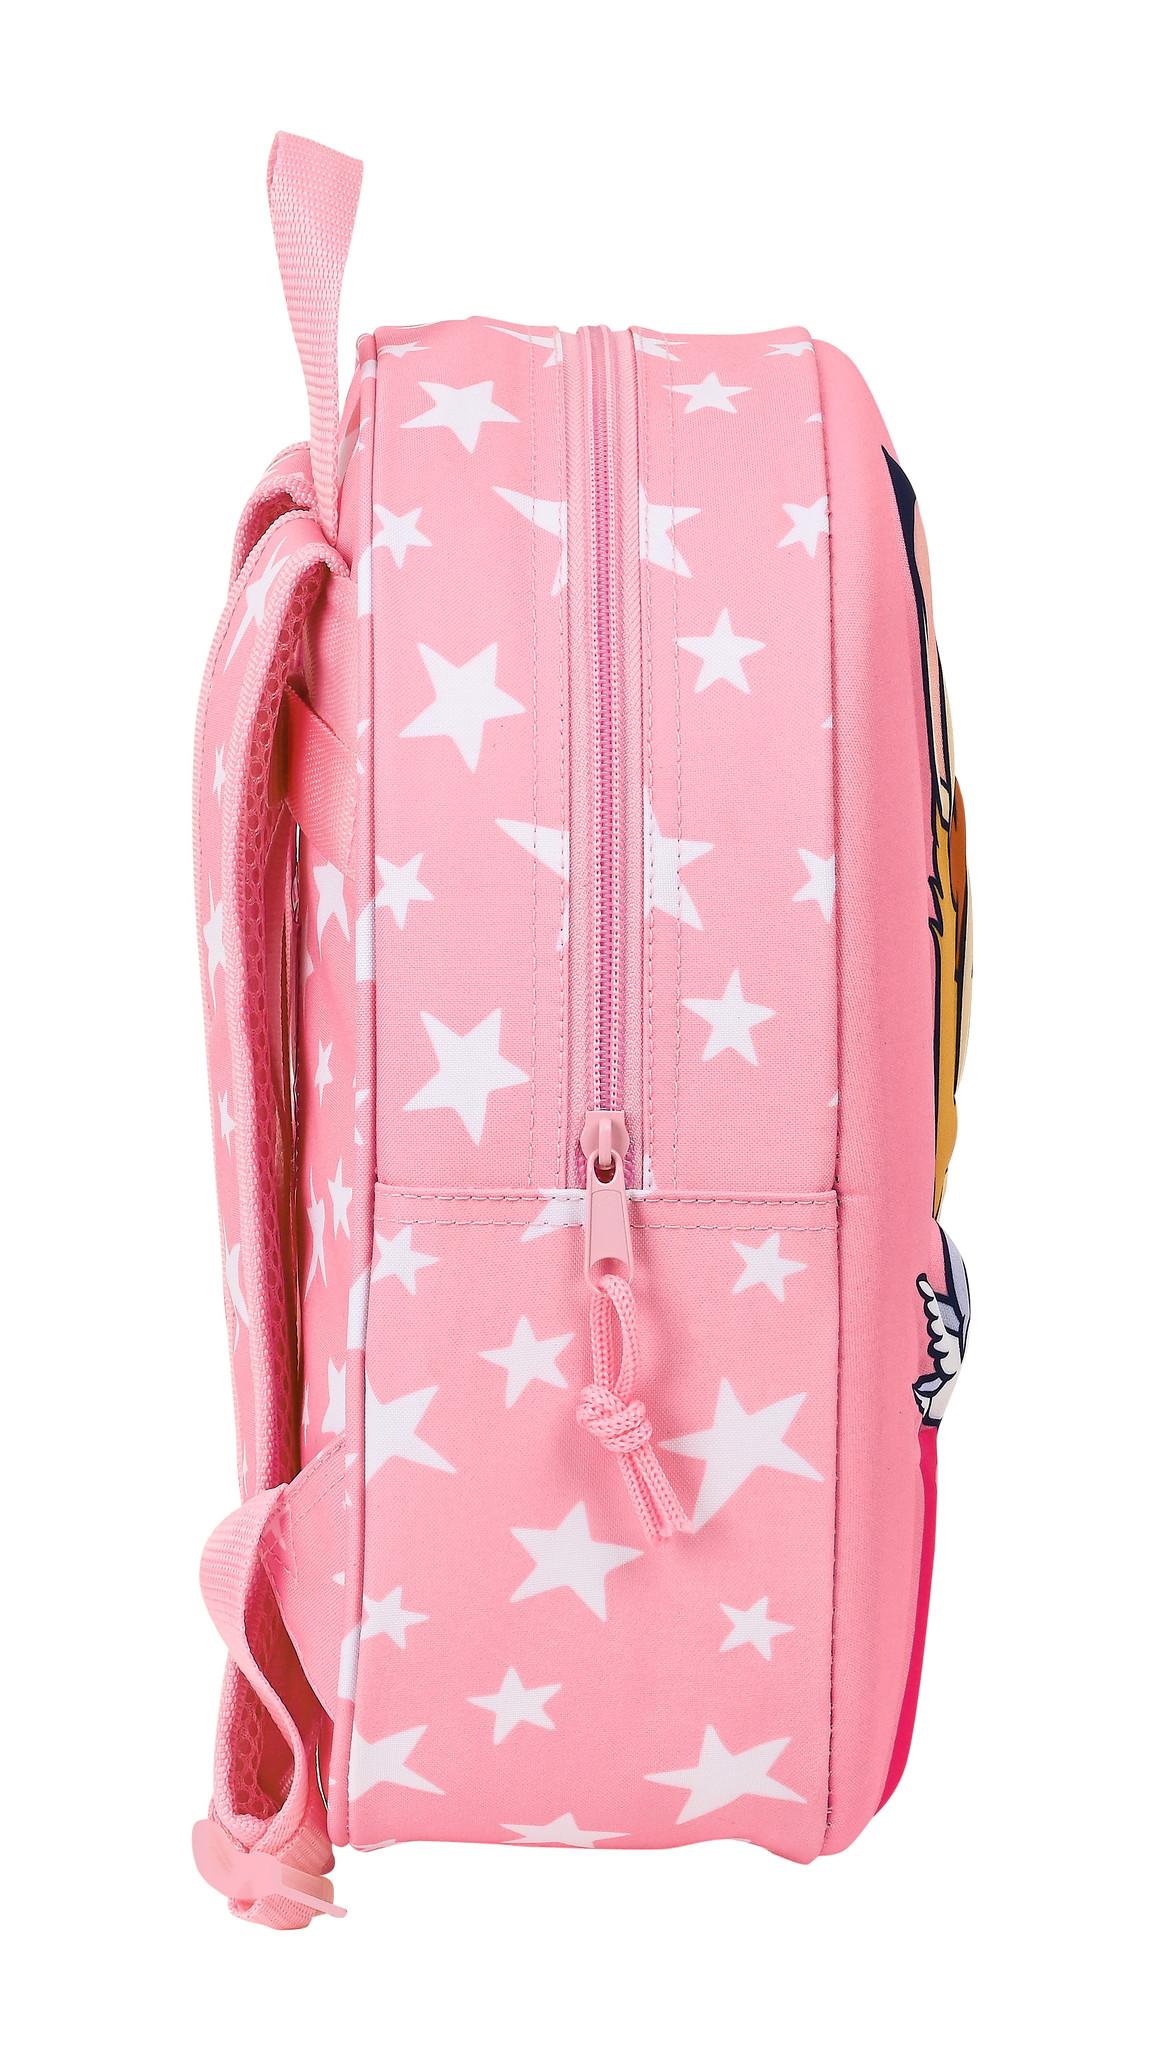 Disney Bambi Toddler backpack 3D - 32 x 27 x 10 cm - Polyester